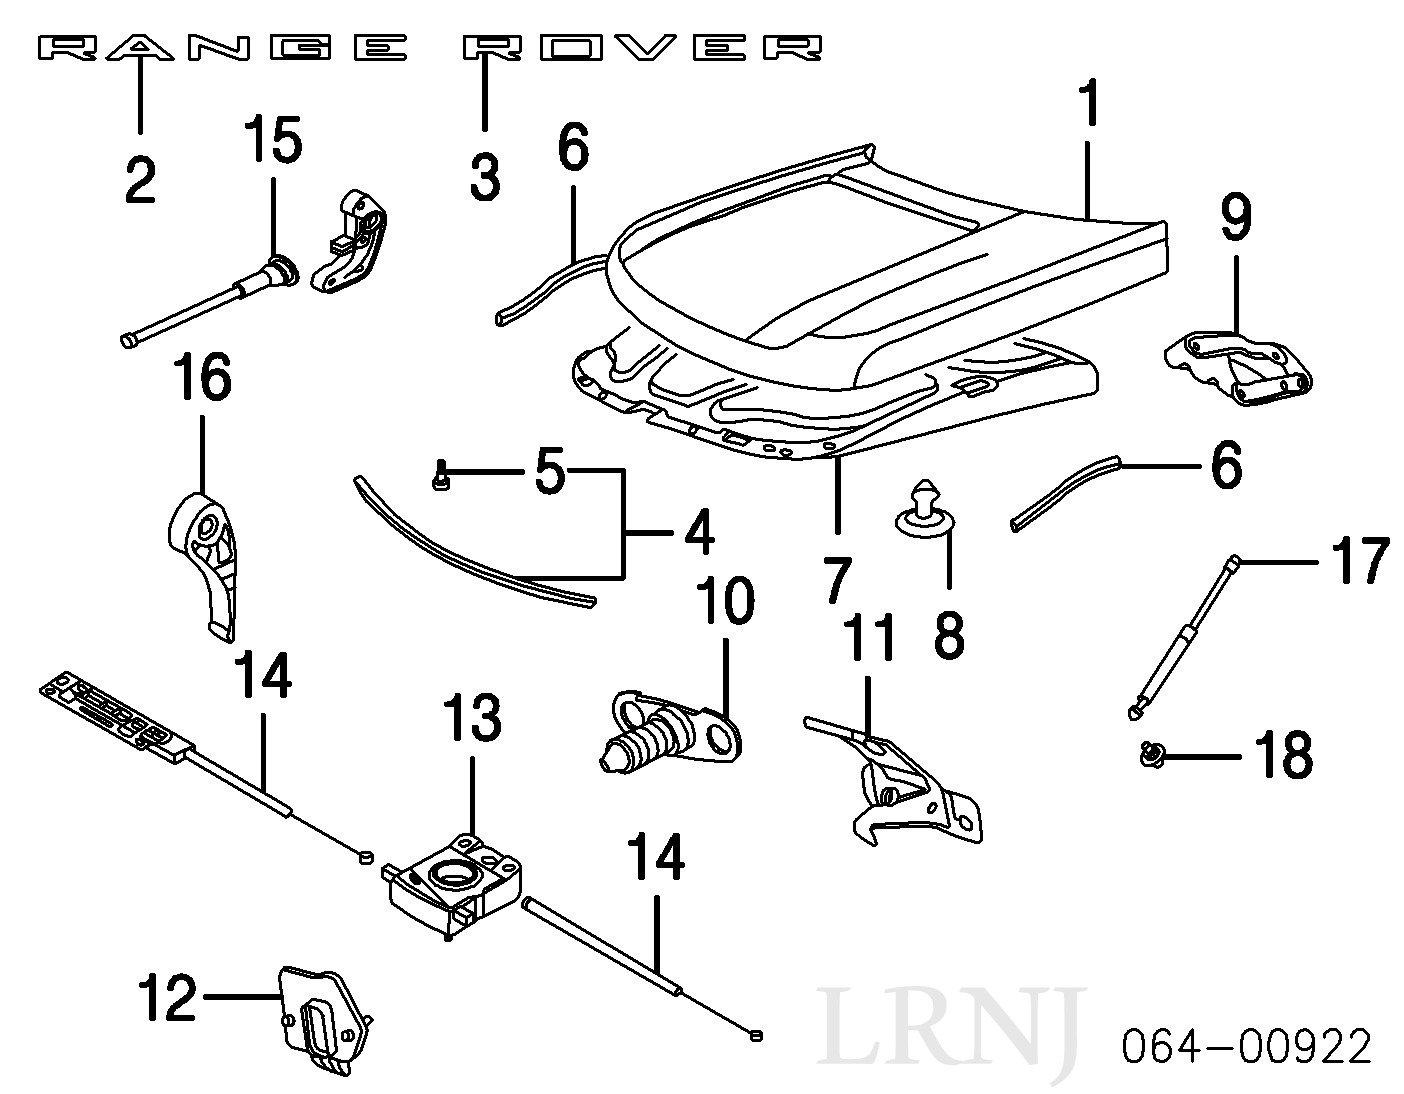 Land Rover Range 2003 2012 Hood Upper Gas Strut 2001 Engine Diagram Set Of 2 Part Bkk760010 Automotive